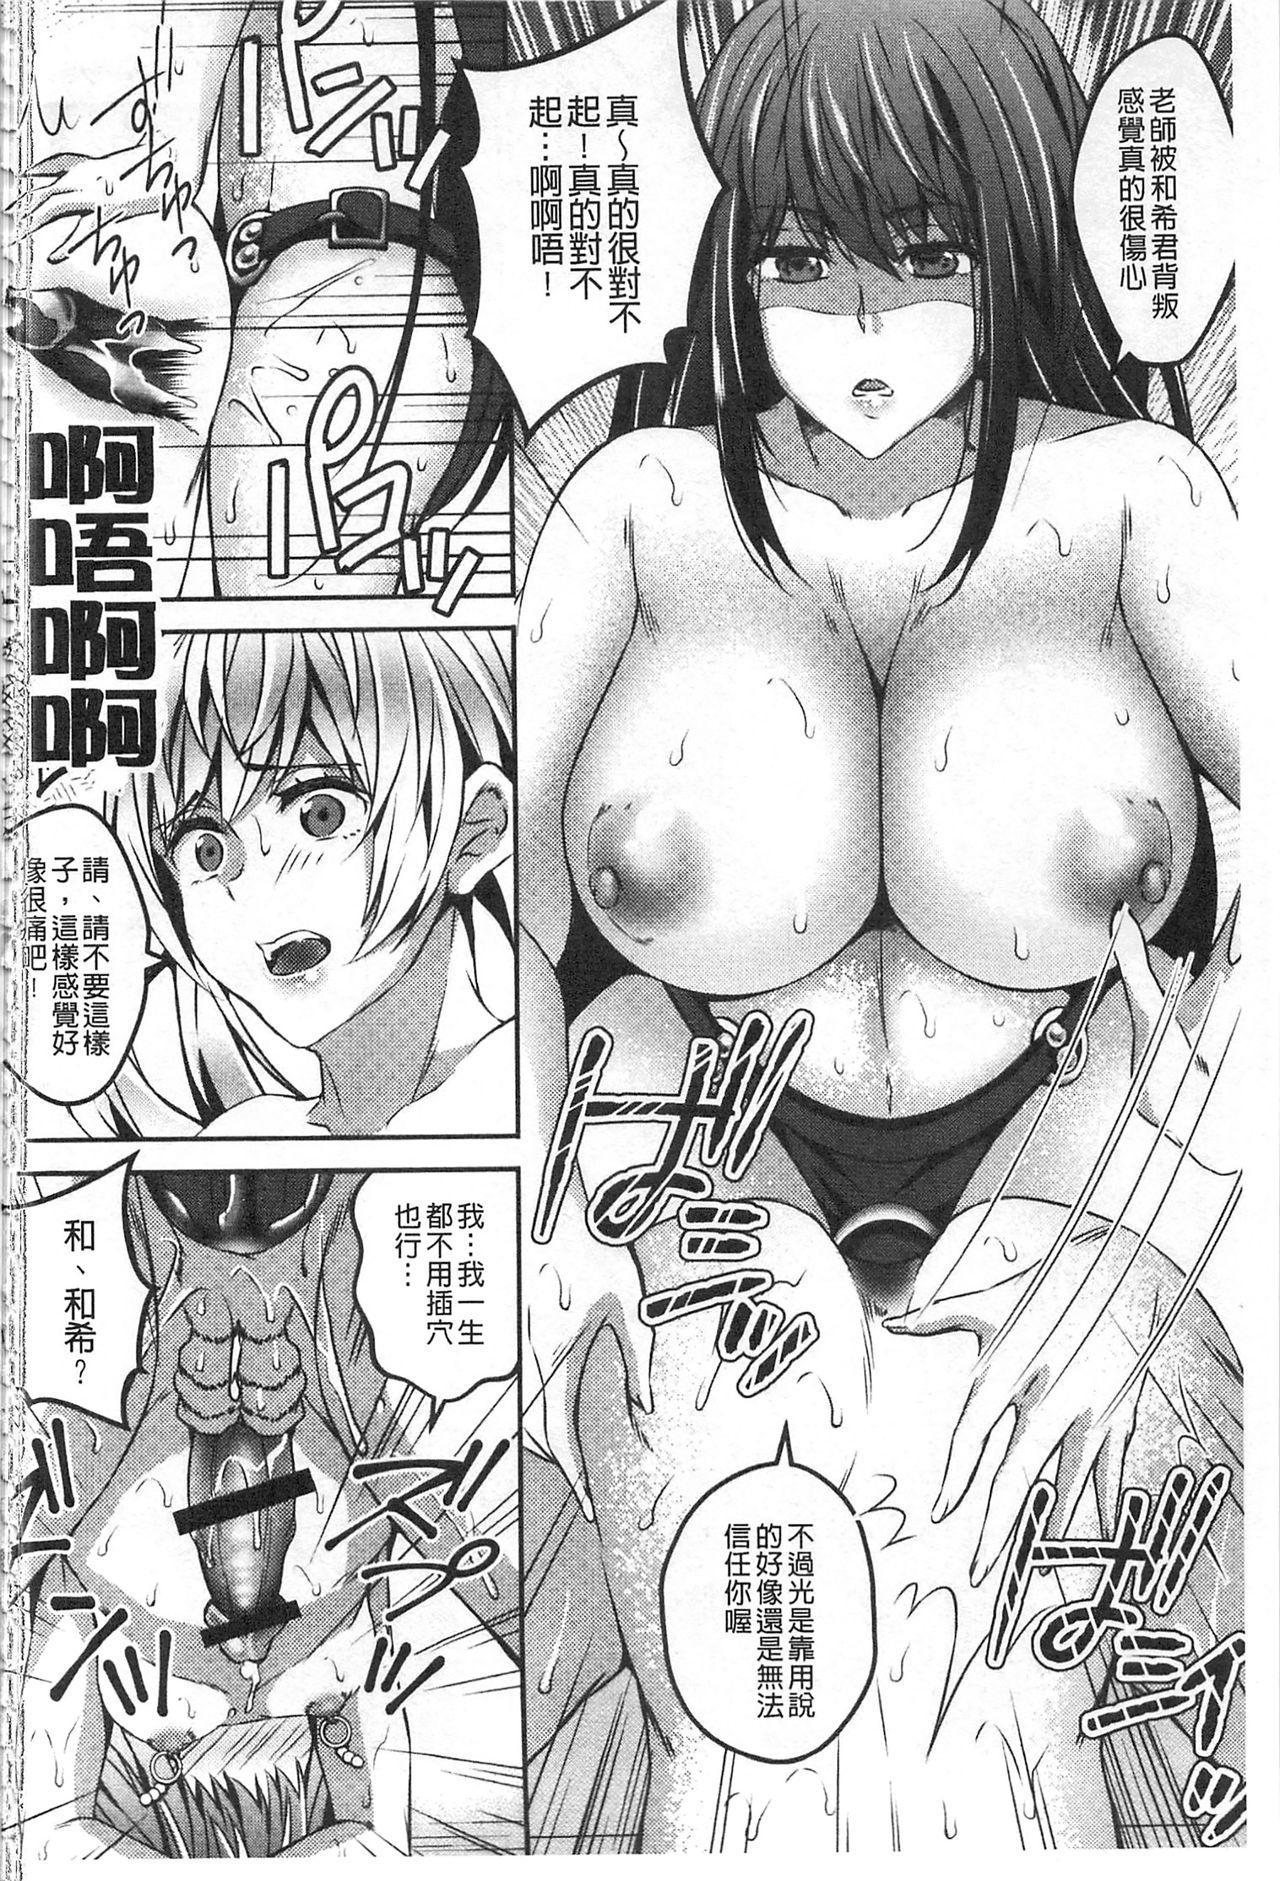 Kanjuku Otome no Odoshikata | 姦熟乙女的脅迫法 37